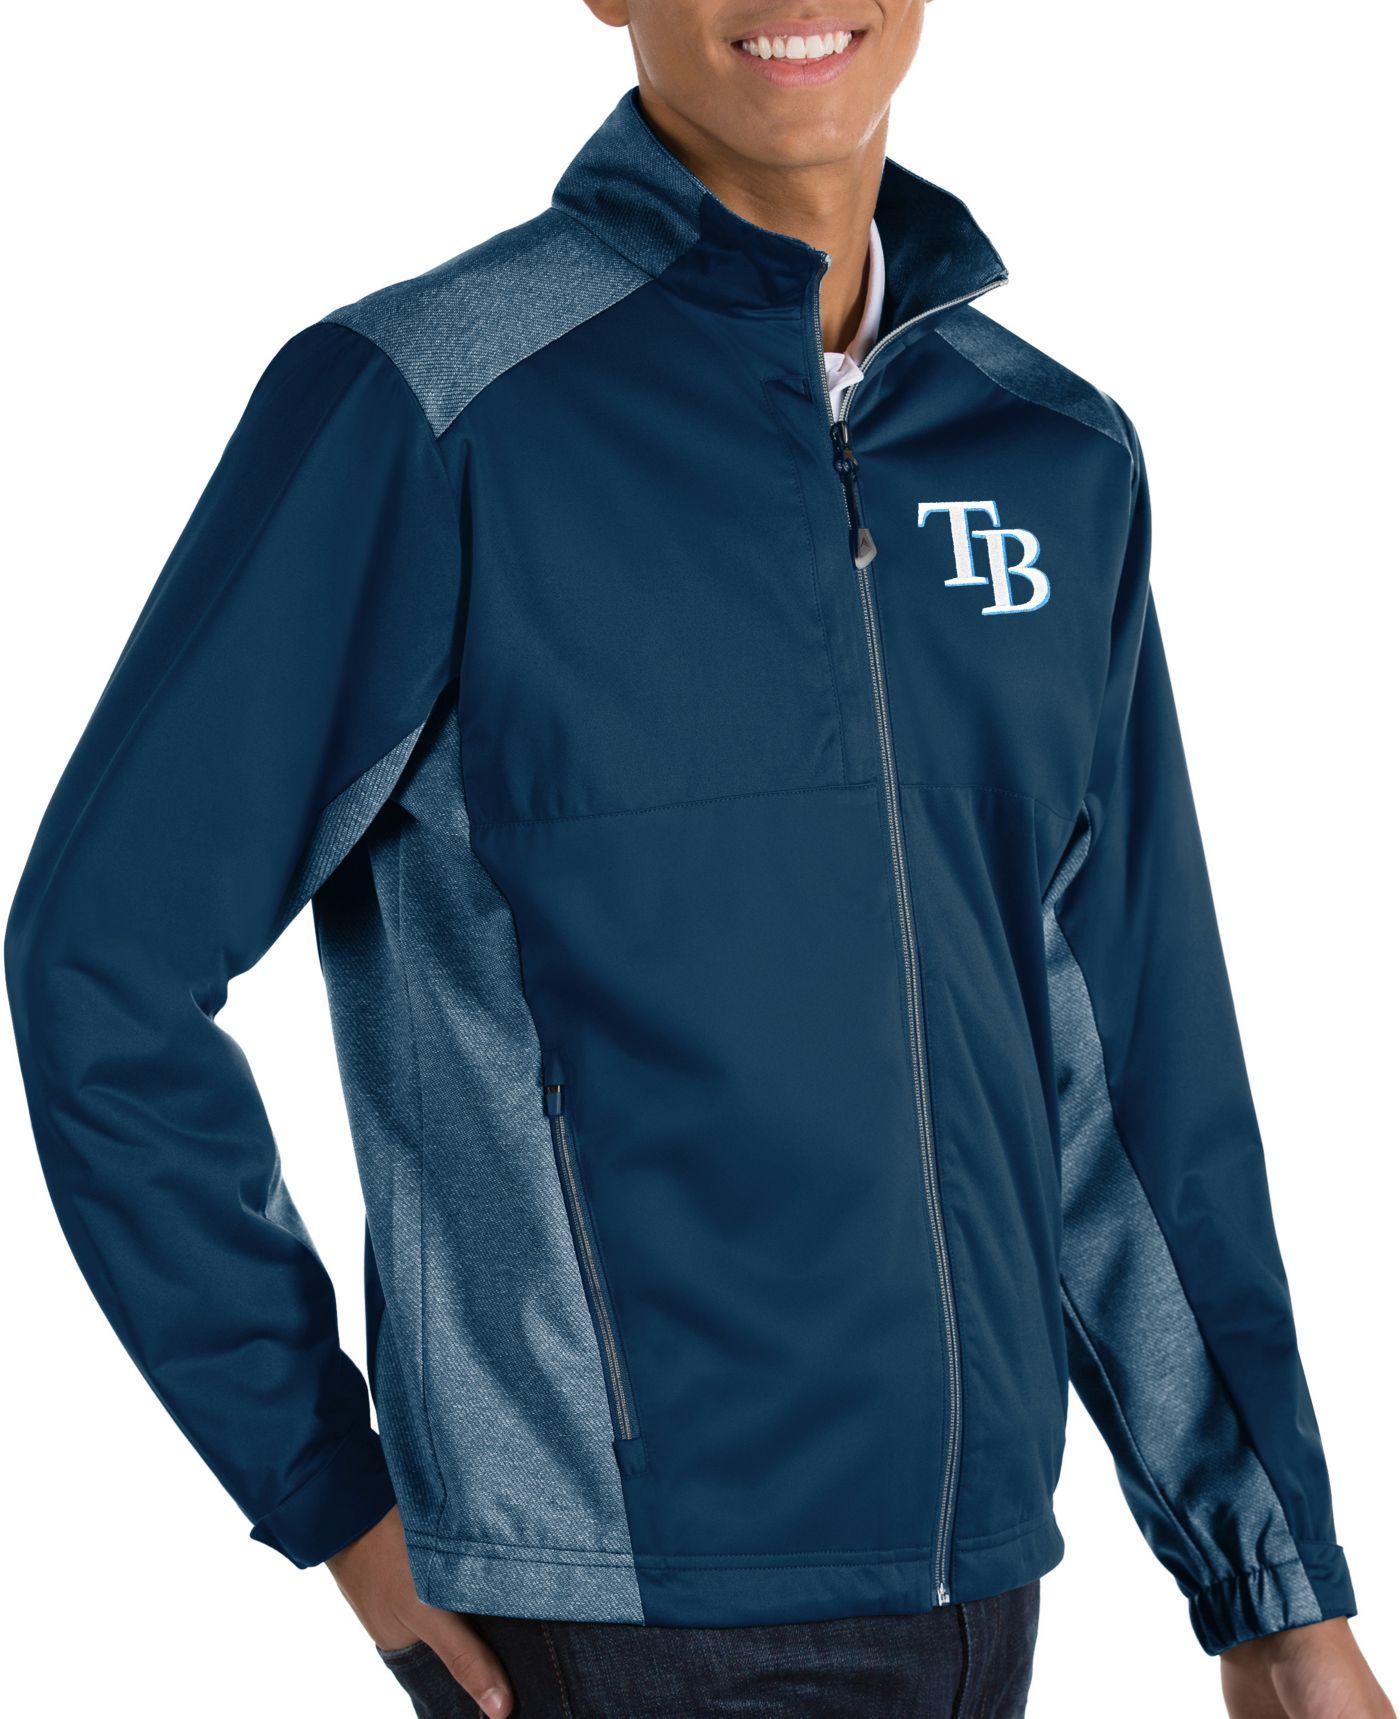 Antigua Men's Tampa Bay Rays Revolve Navy Full-Zip Jacket